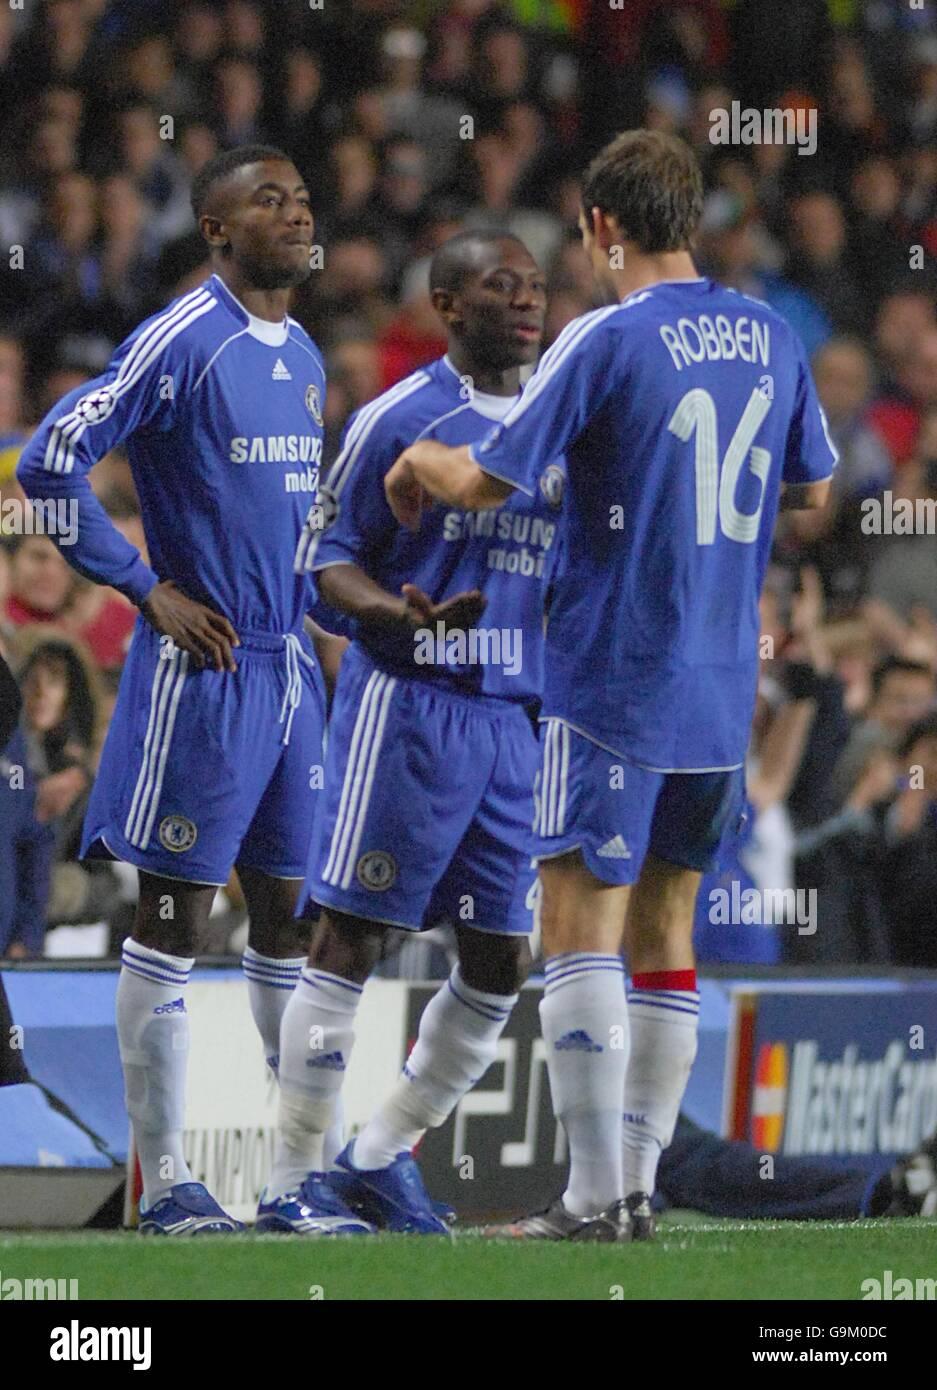 Soccer - UEFA Champions League - Group A - Chelsea v Levski Sofia - Stamford Bridge - Stock Image